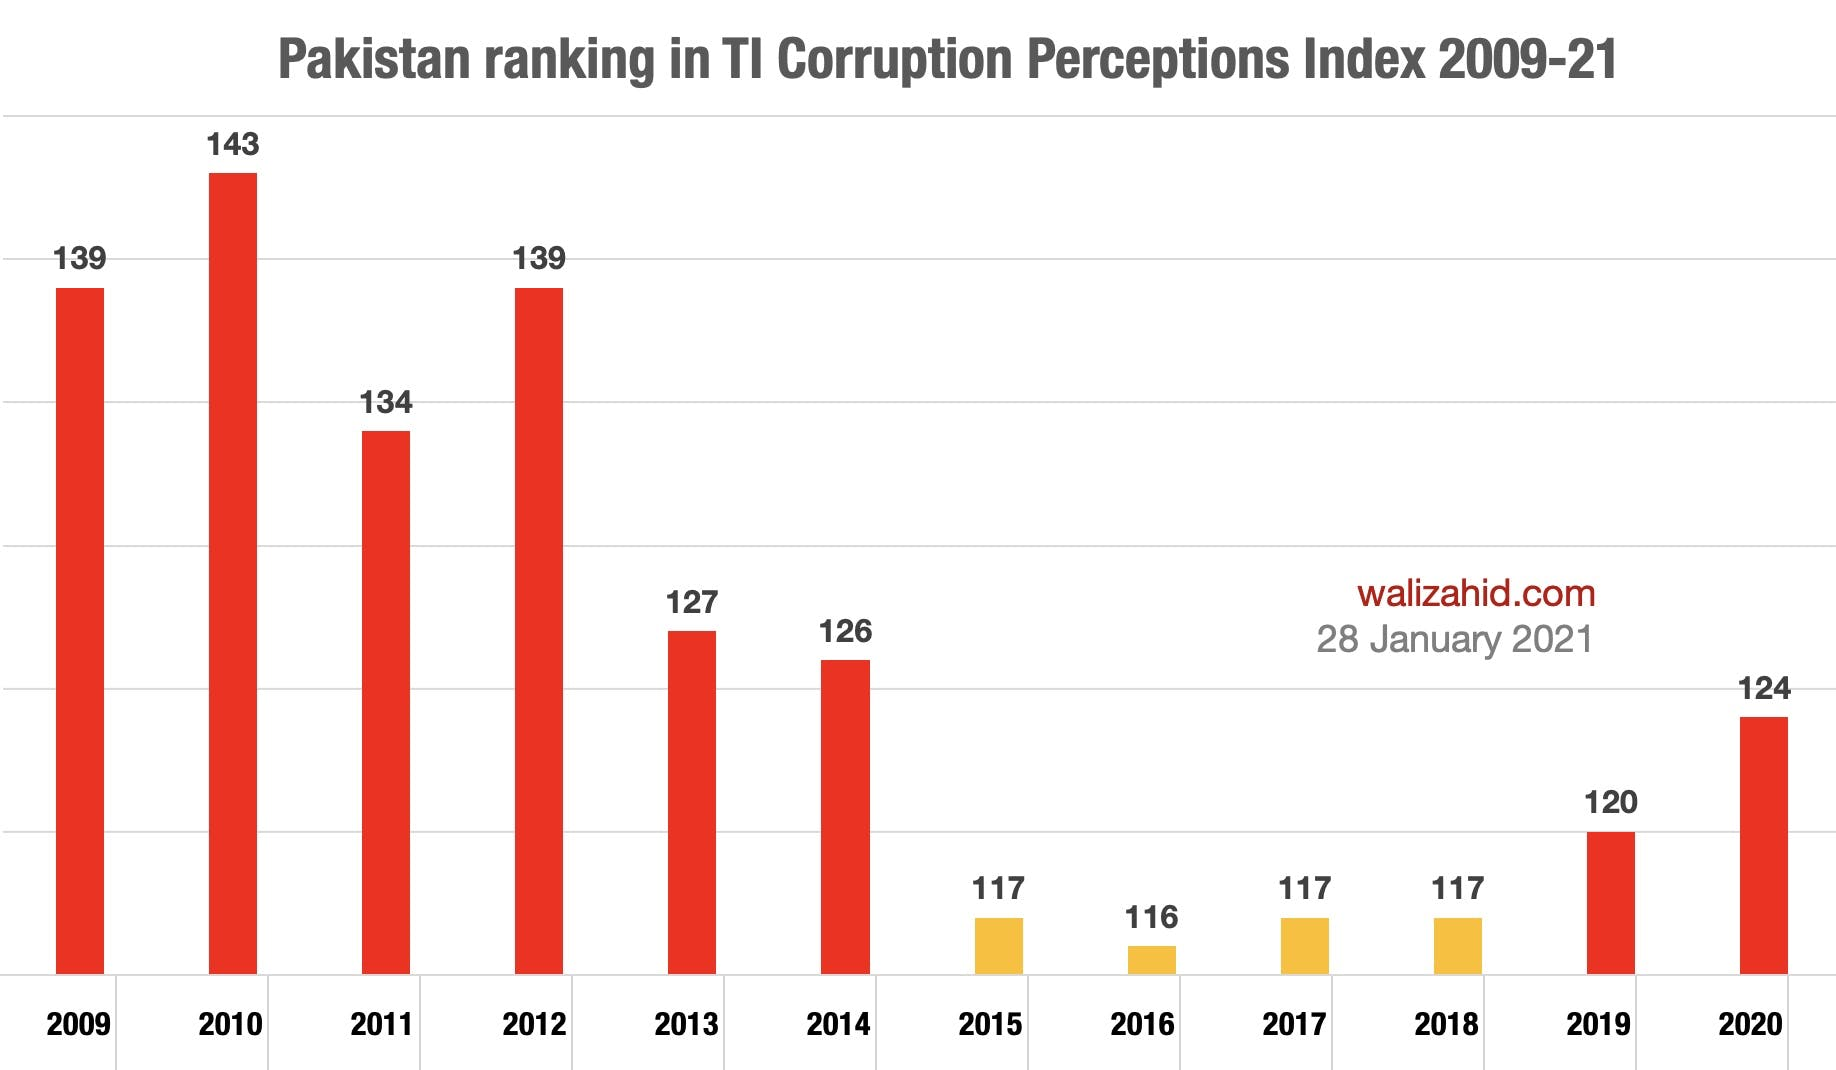 Corruption perception in Pakistan: 2009-2021